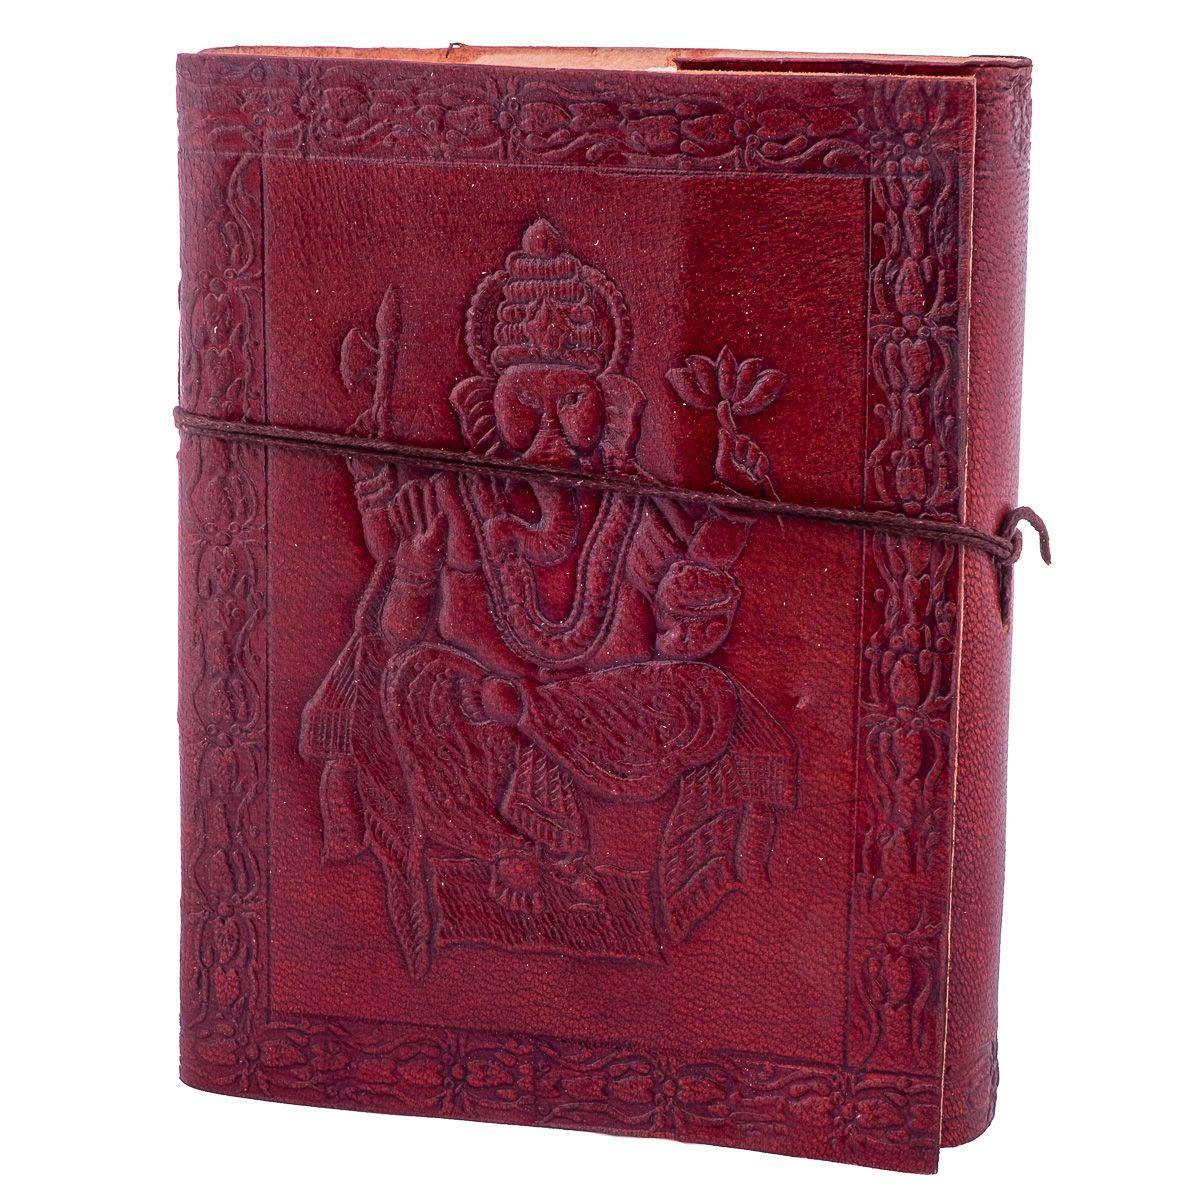 Leather notebook Ganesh India